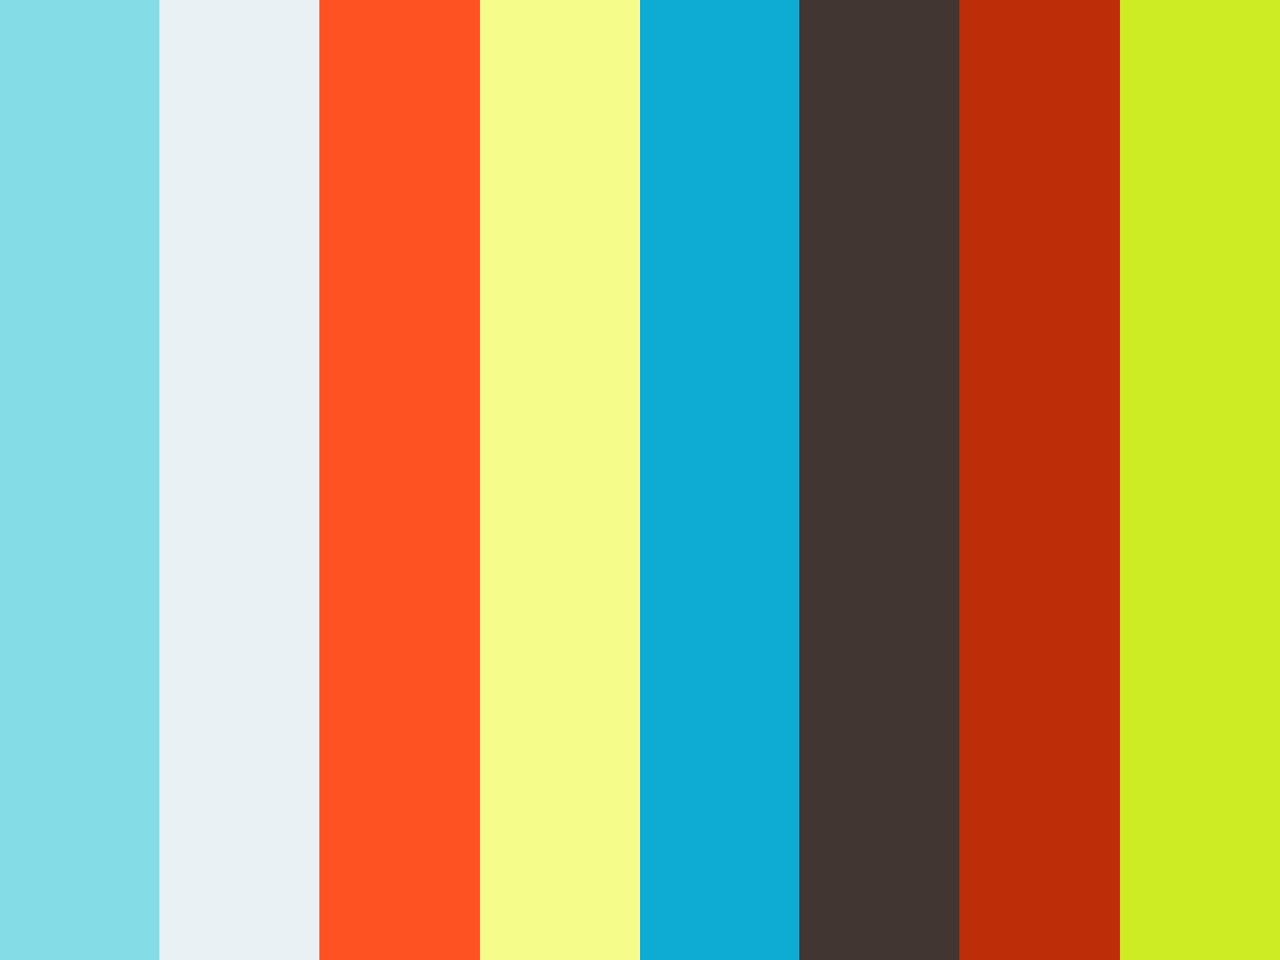 Molokai Covid19 Update - Thursday, April 9, 2020